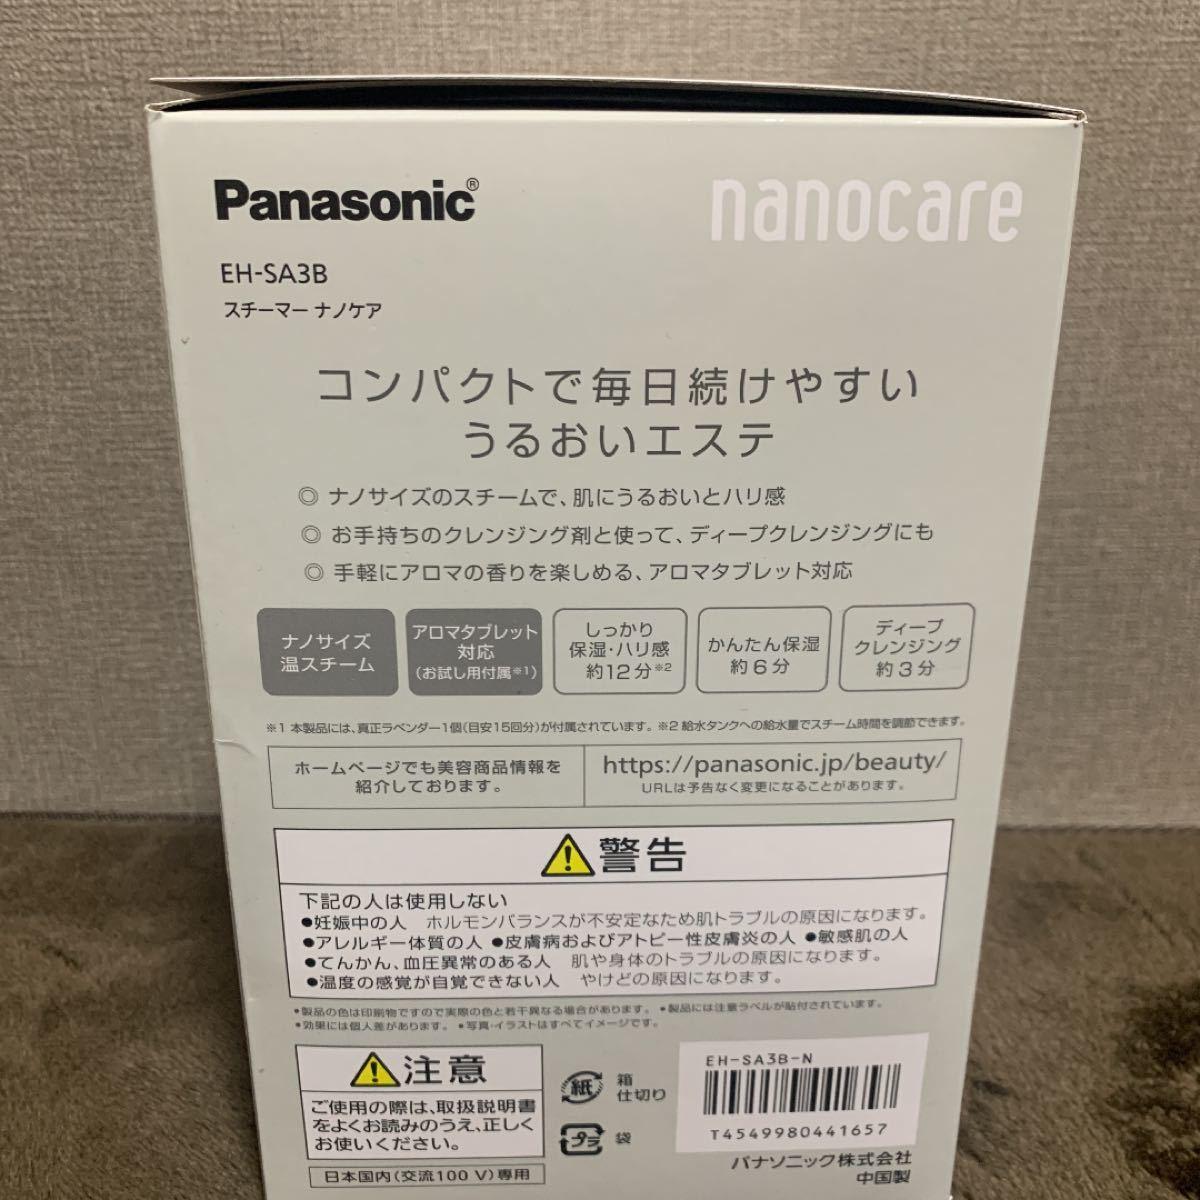 Panasonic ナノケア スチーマー EH-SA3B-N 新品未開封品